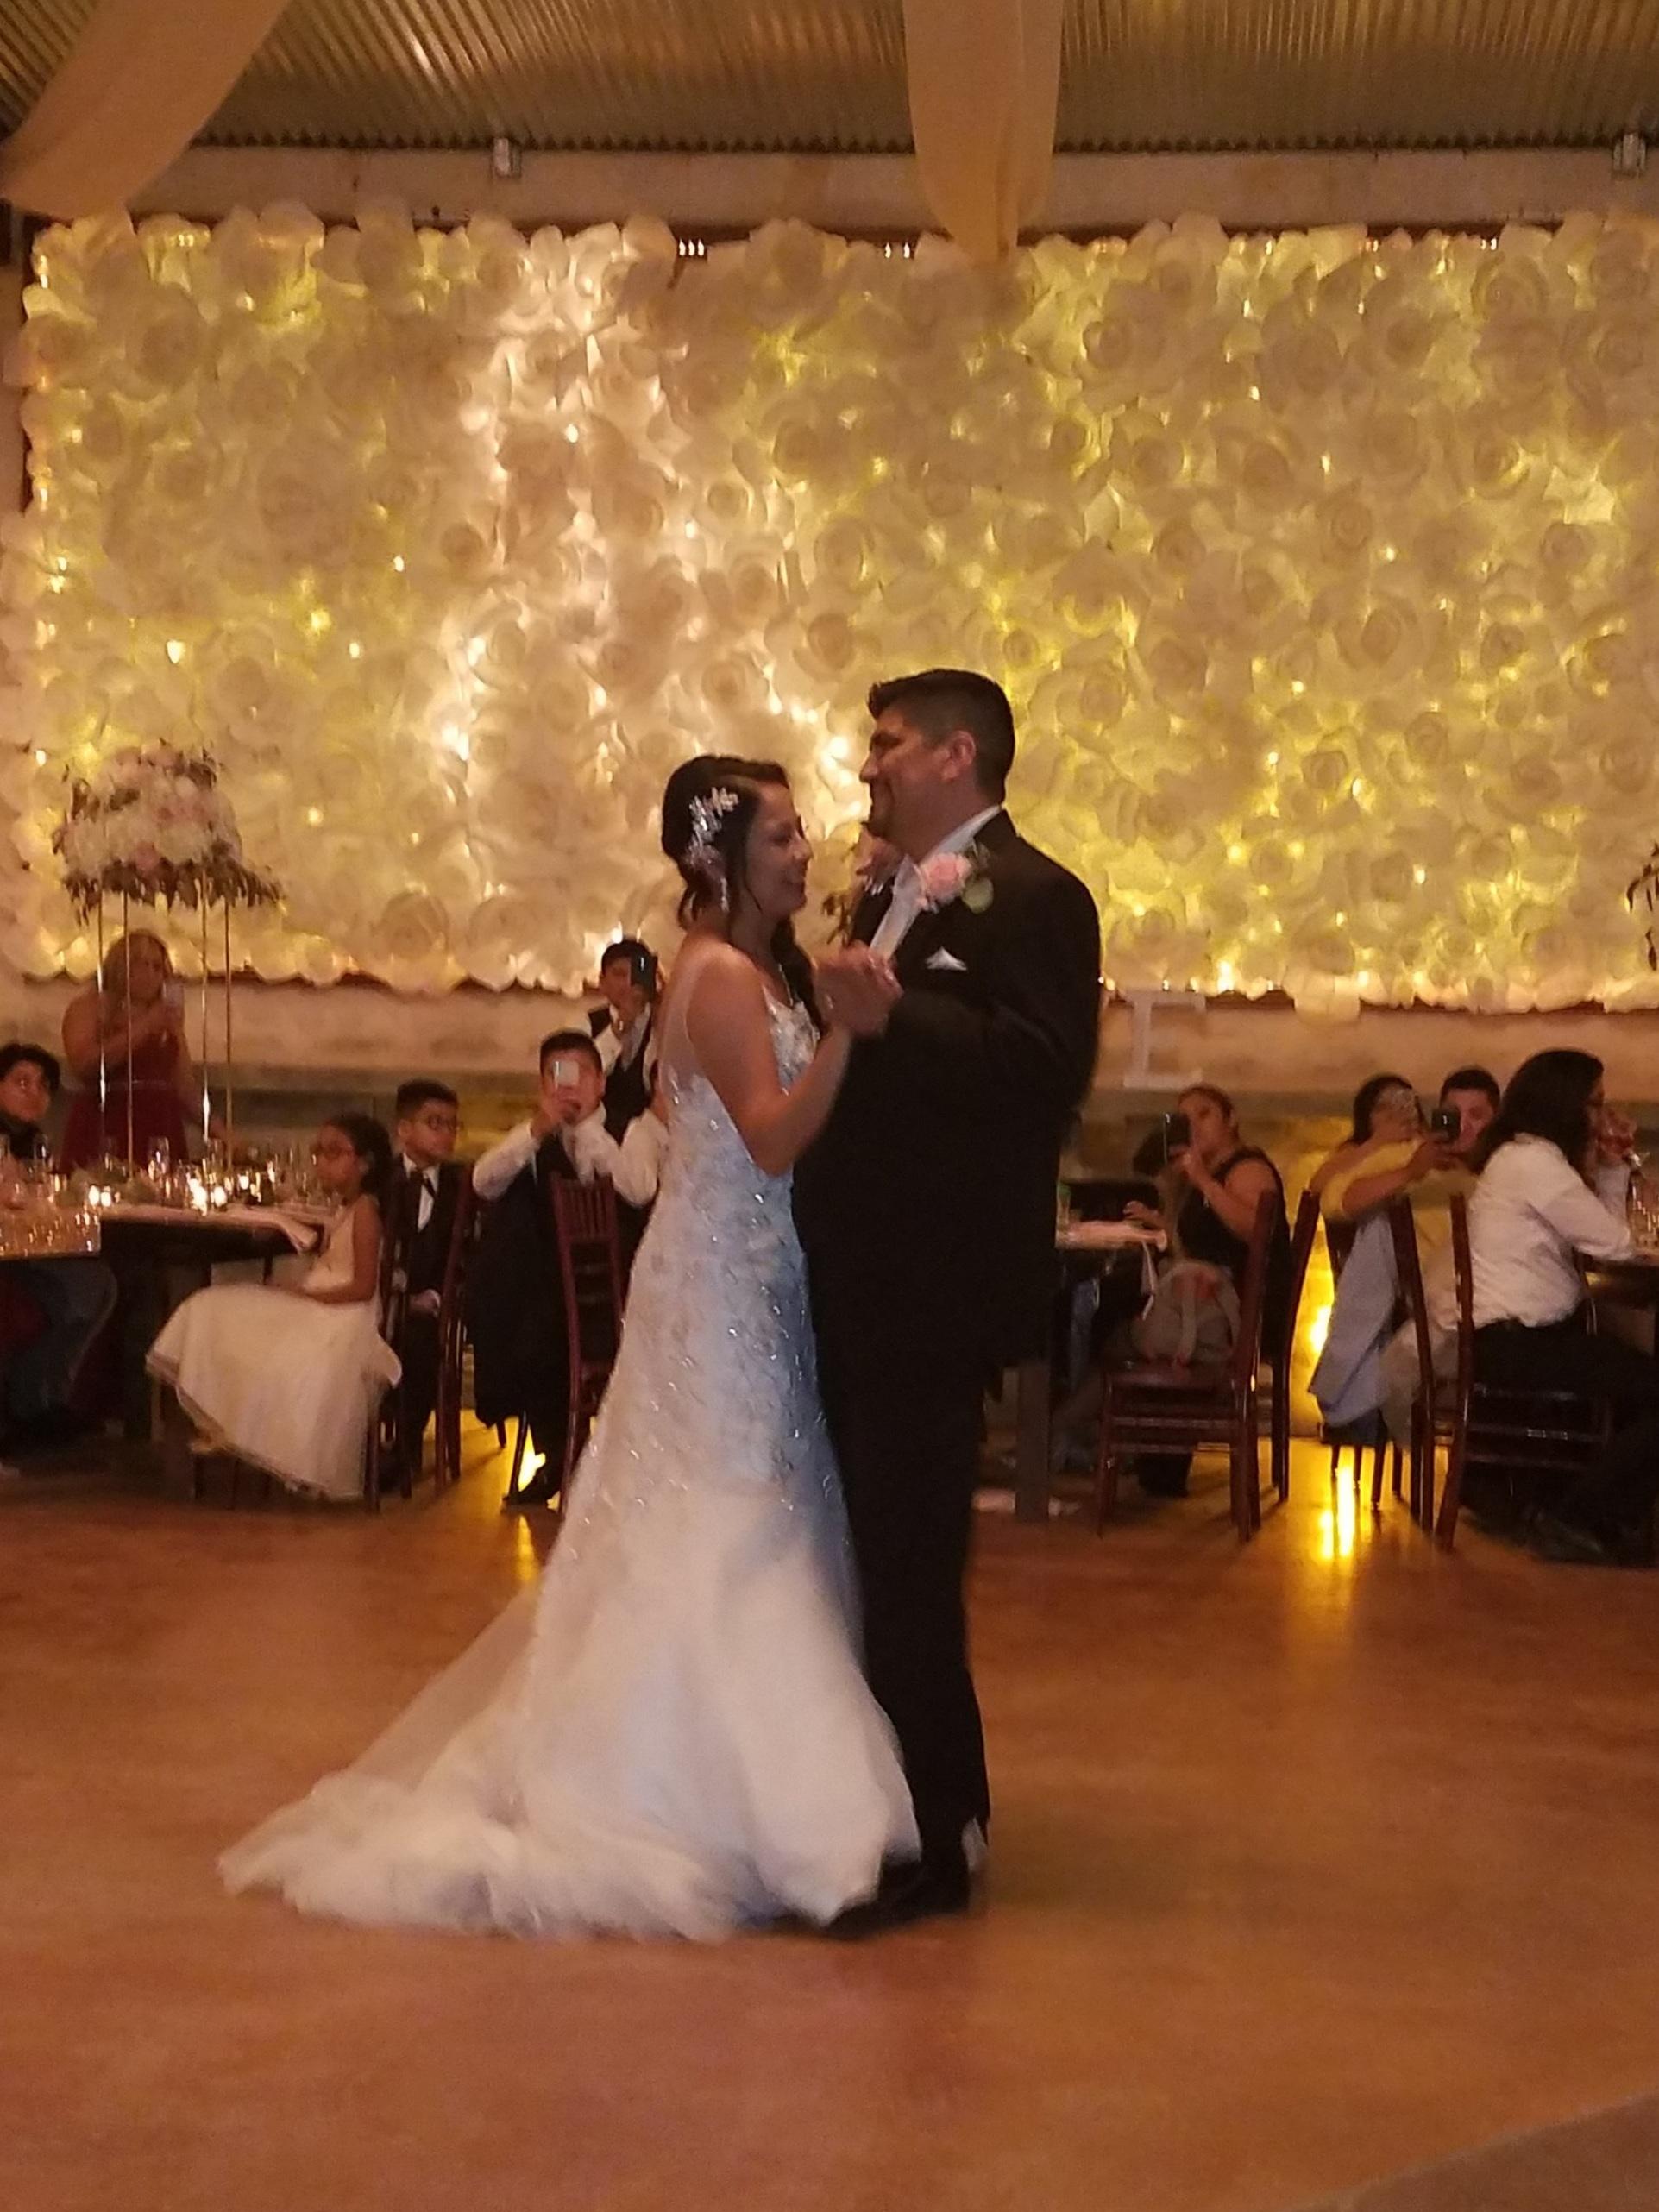 The Oaks at Heavenly- Graceful Moments San Antonio Wedding Planning Planner – 3.jpeg